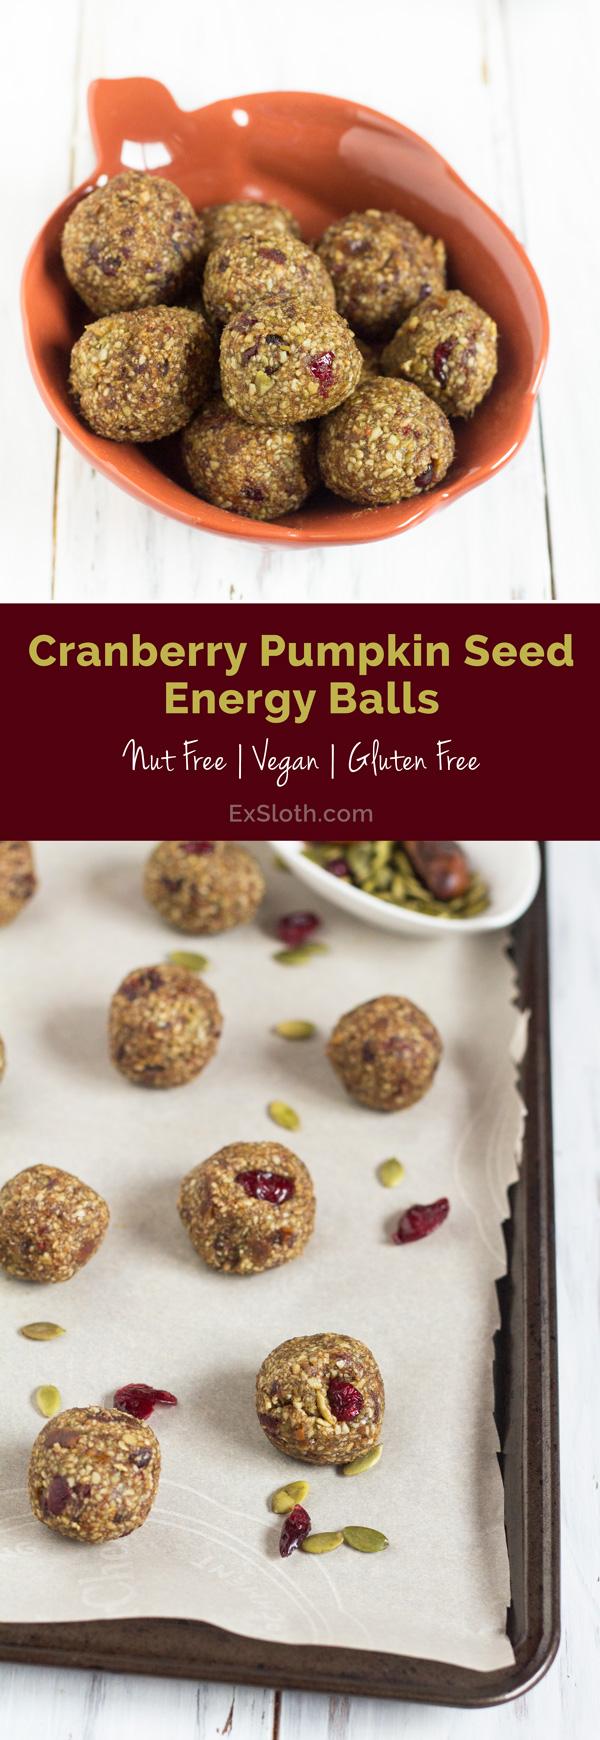 Vegan, Gluten Free & Nut Free Cranberry Pumpkin Seed Energy Balls via @ExSloth | ExSloth.com